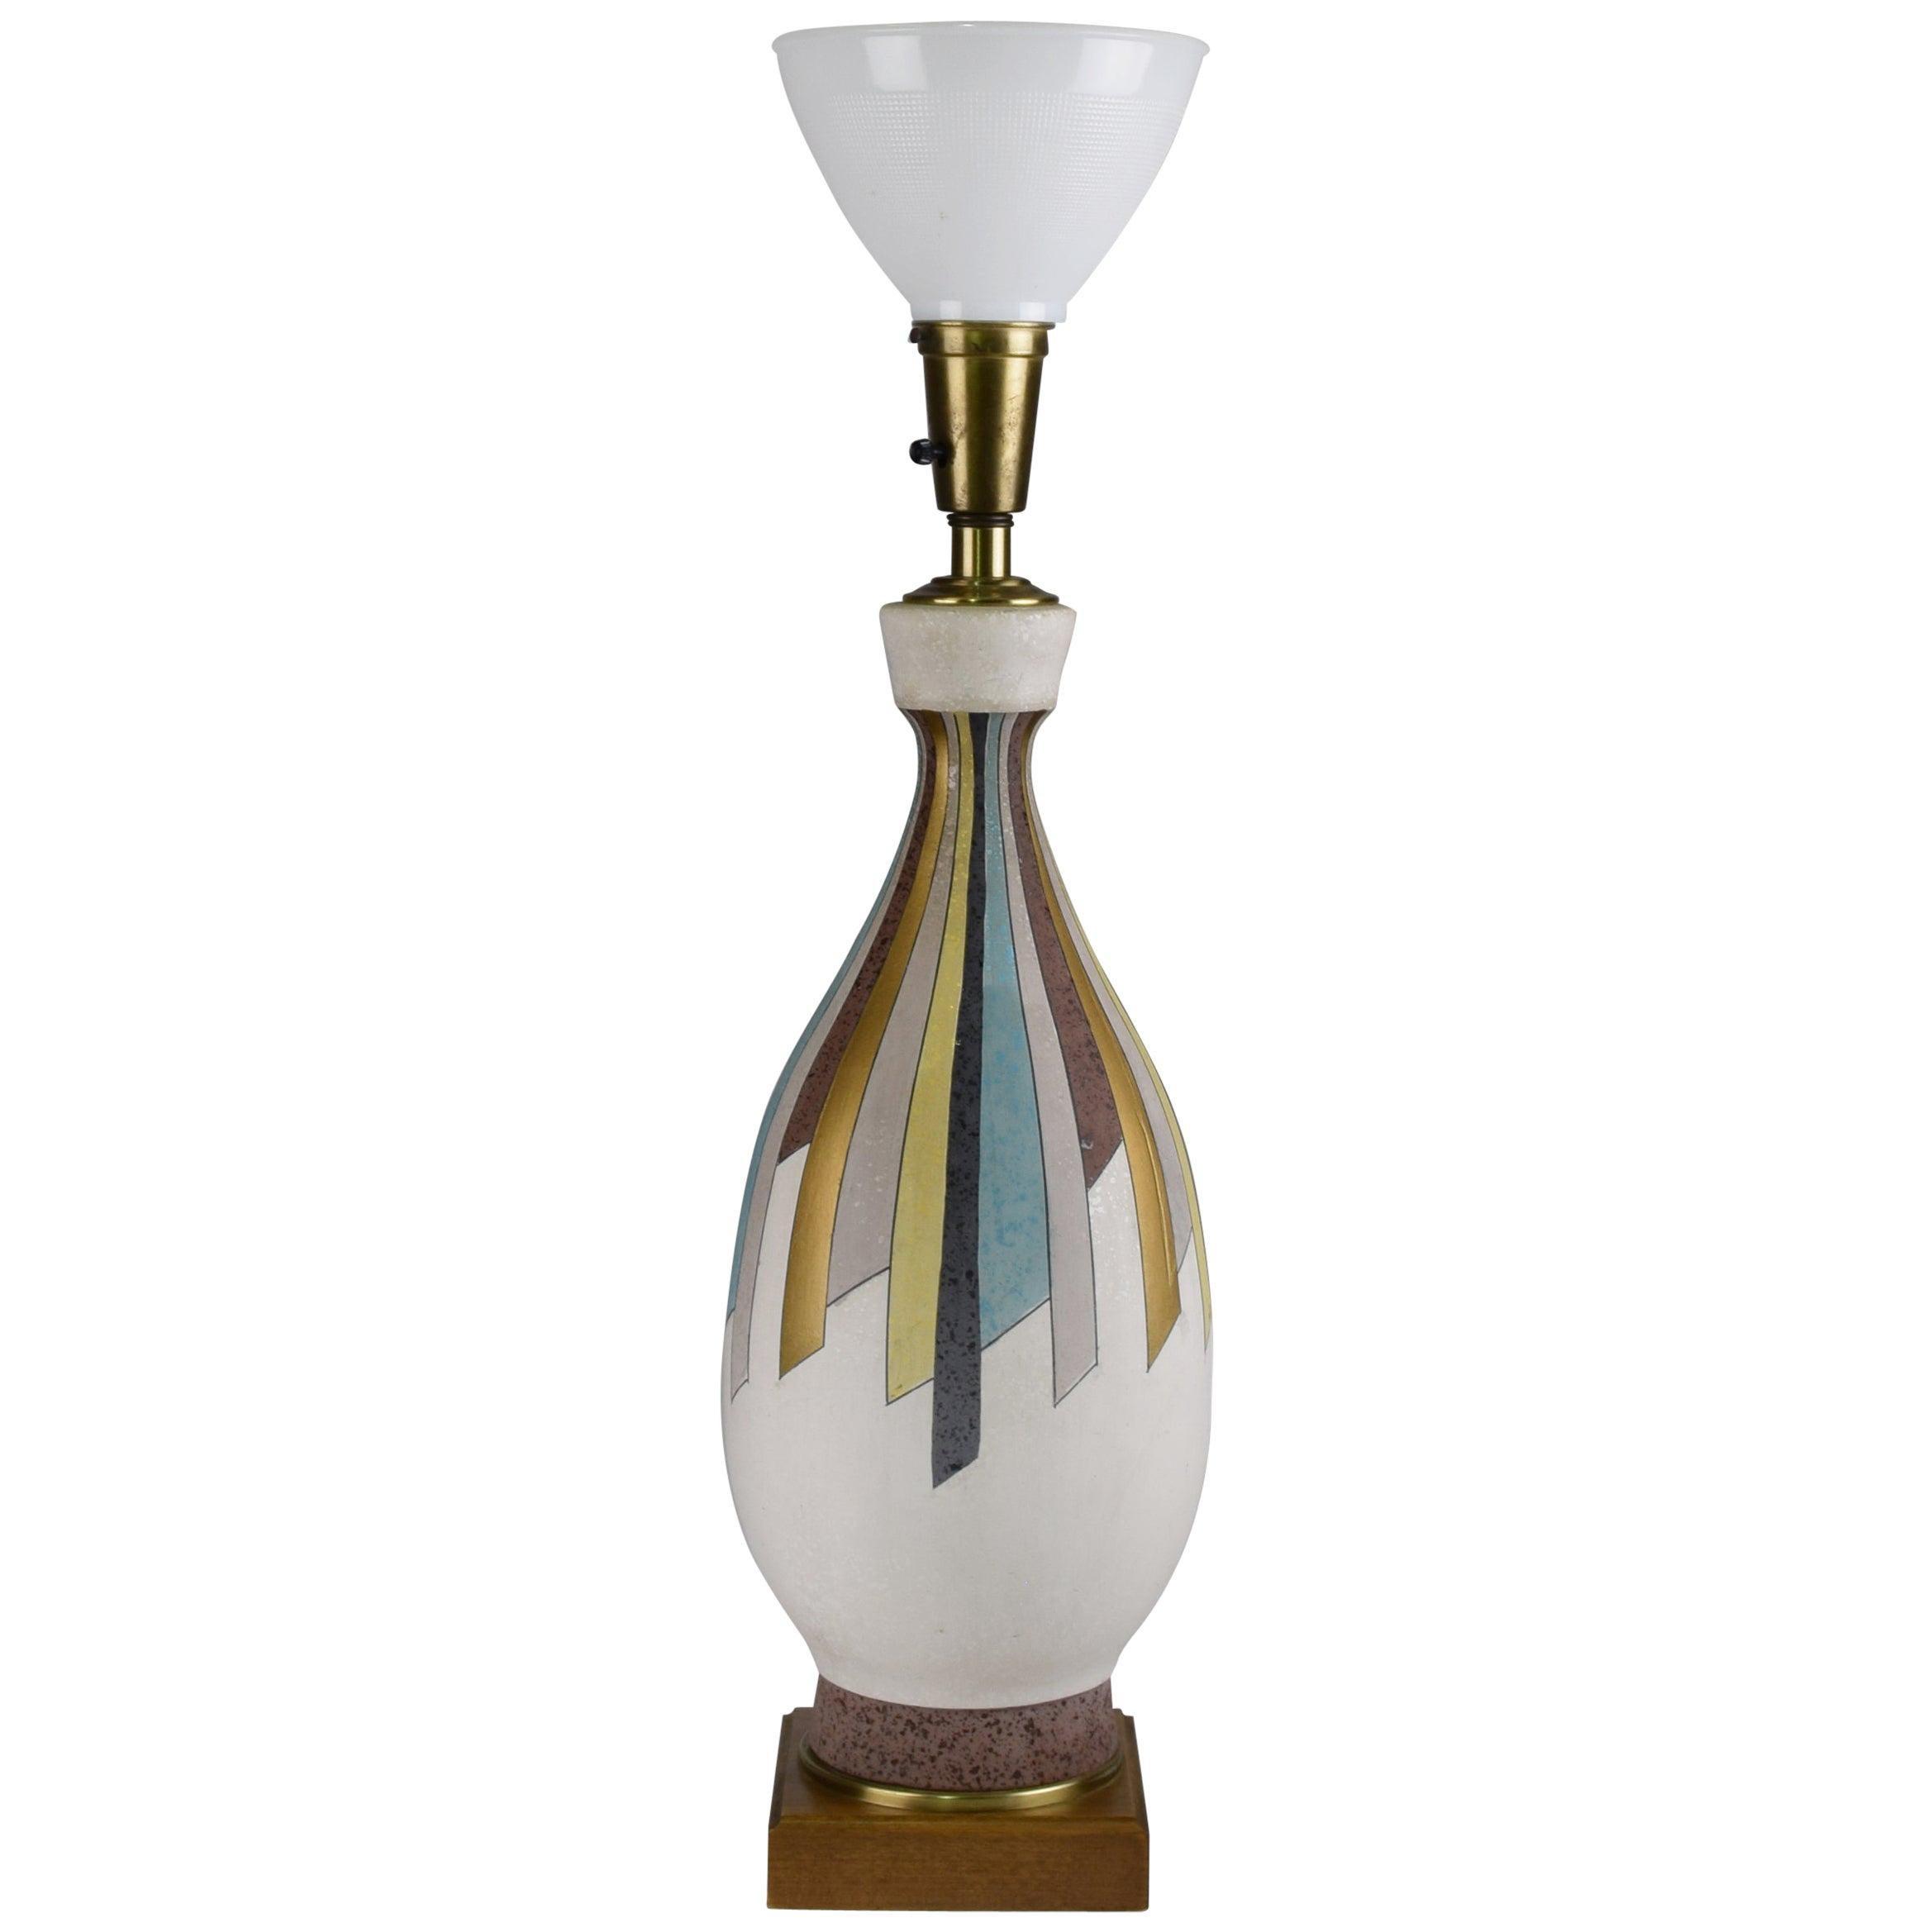 California Modern Table Lamp by Tye